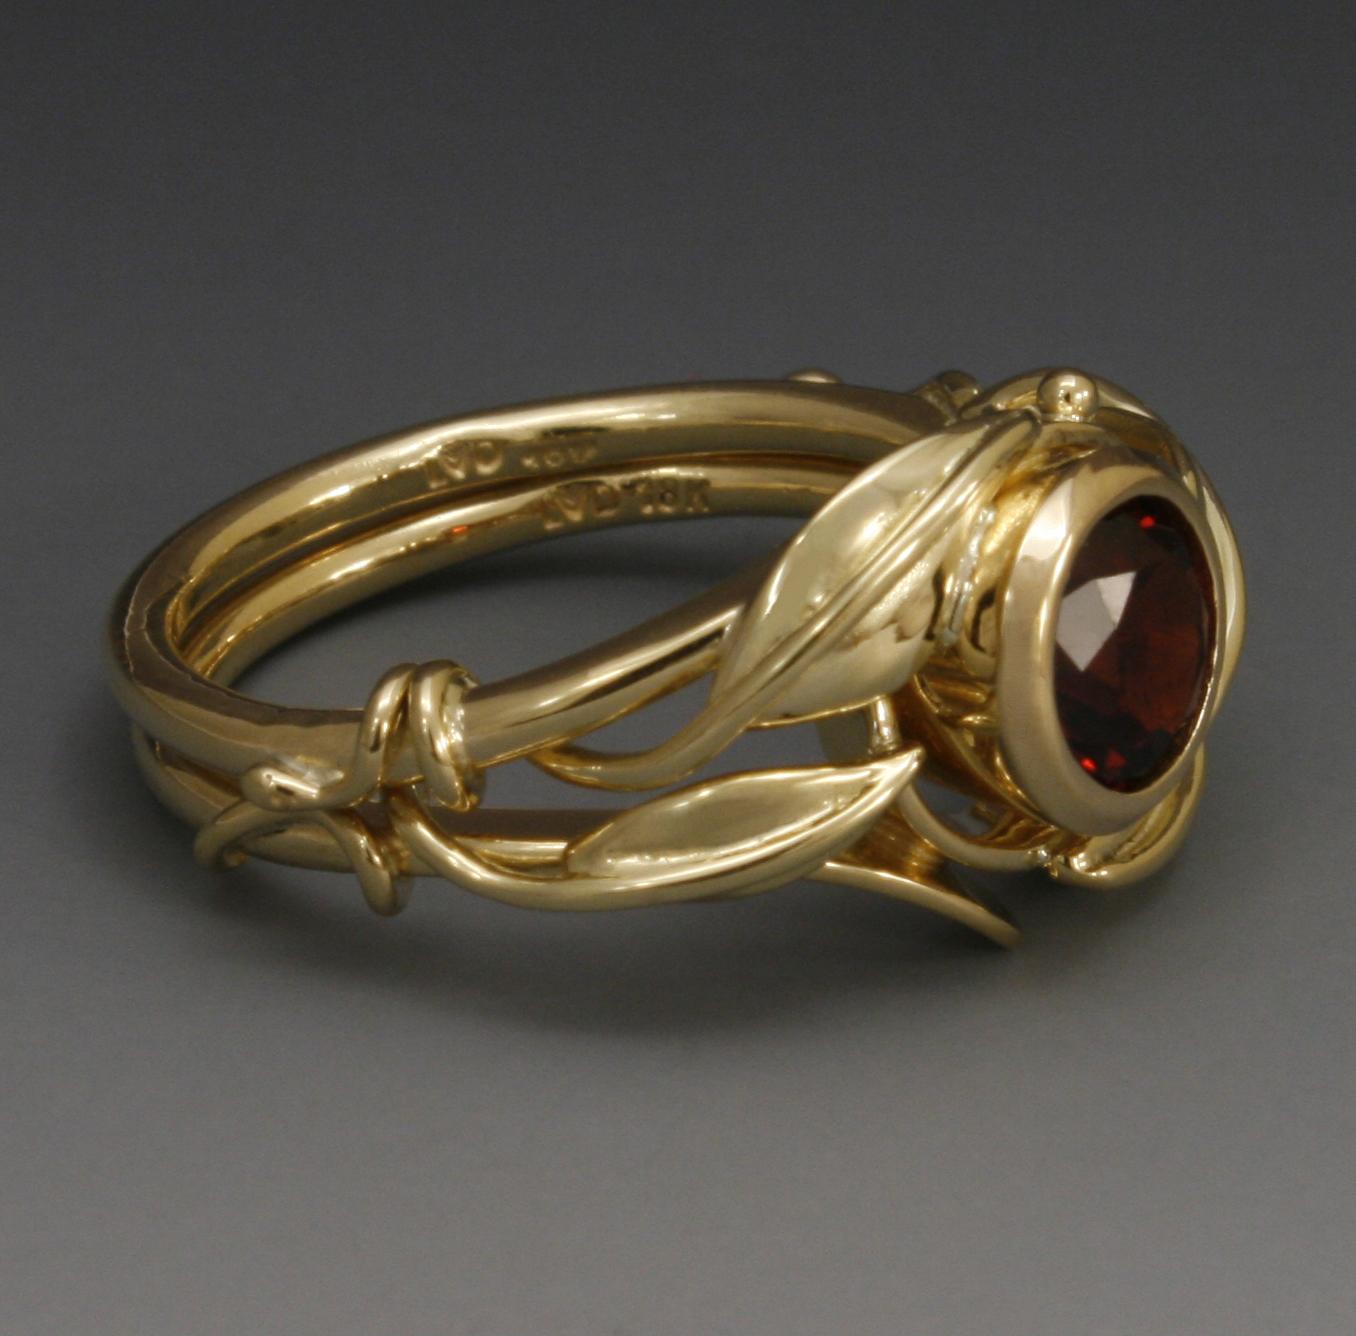 Antique Pyrope Ring